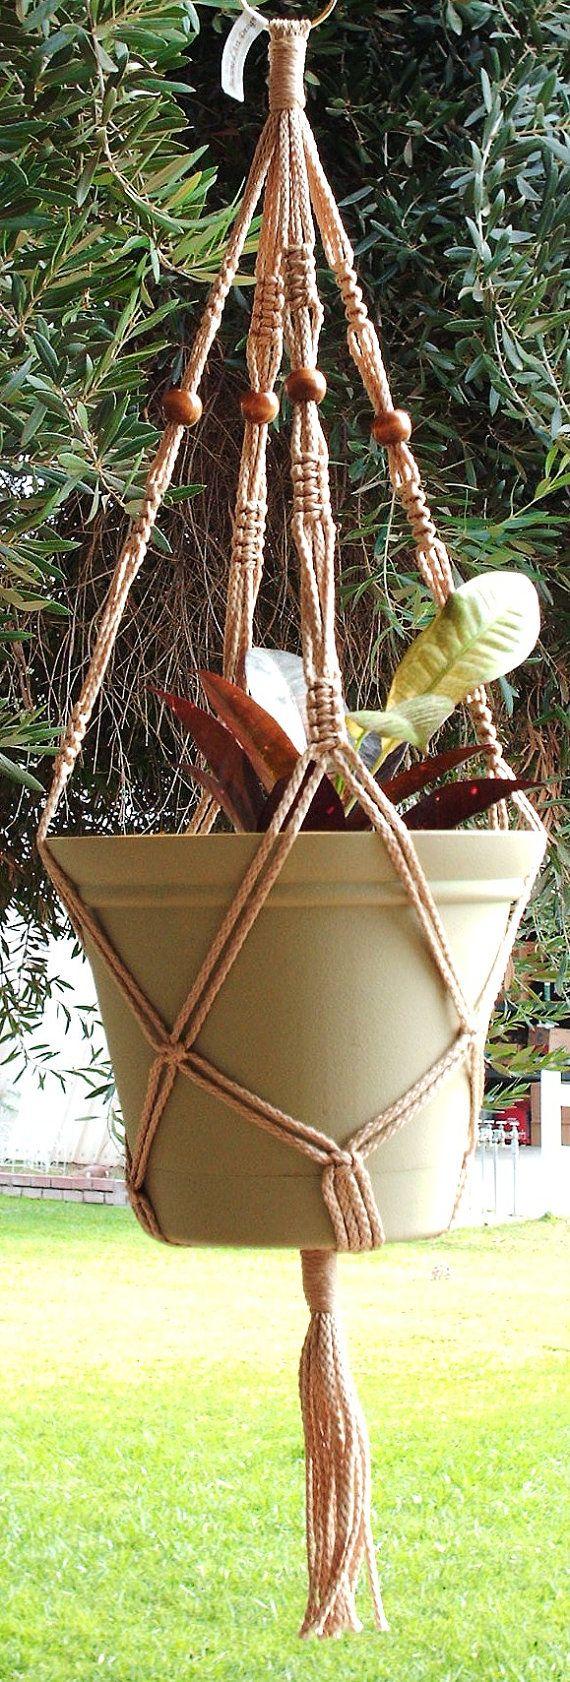 Macrame Plant Hanger Vintage Style 30inch by MacrameDesign on Etsy, $9.99